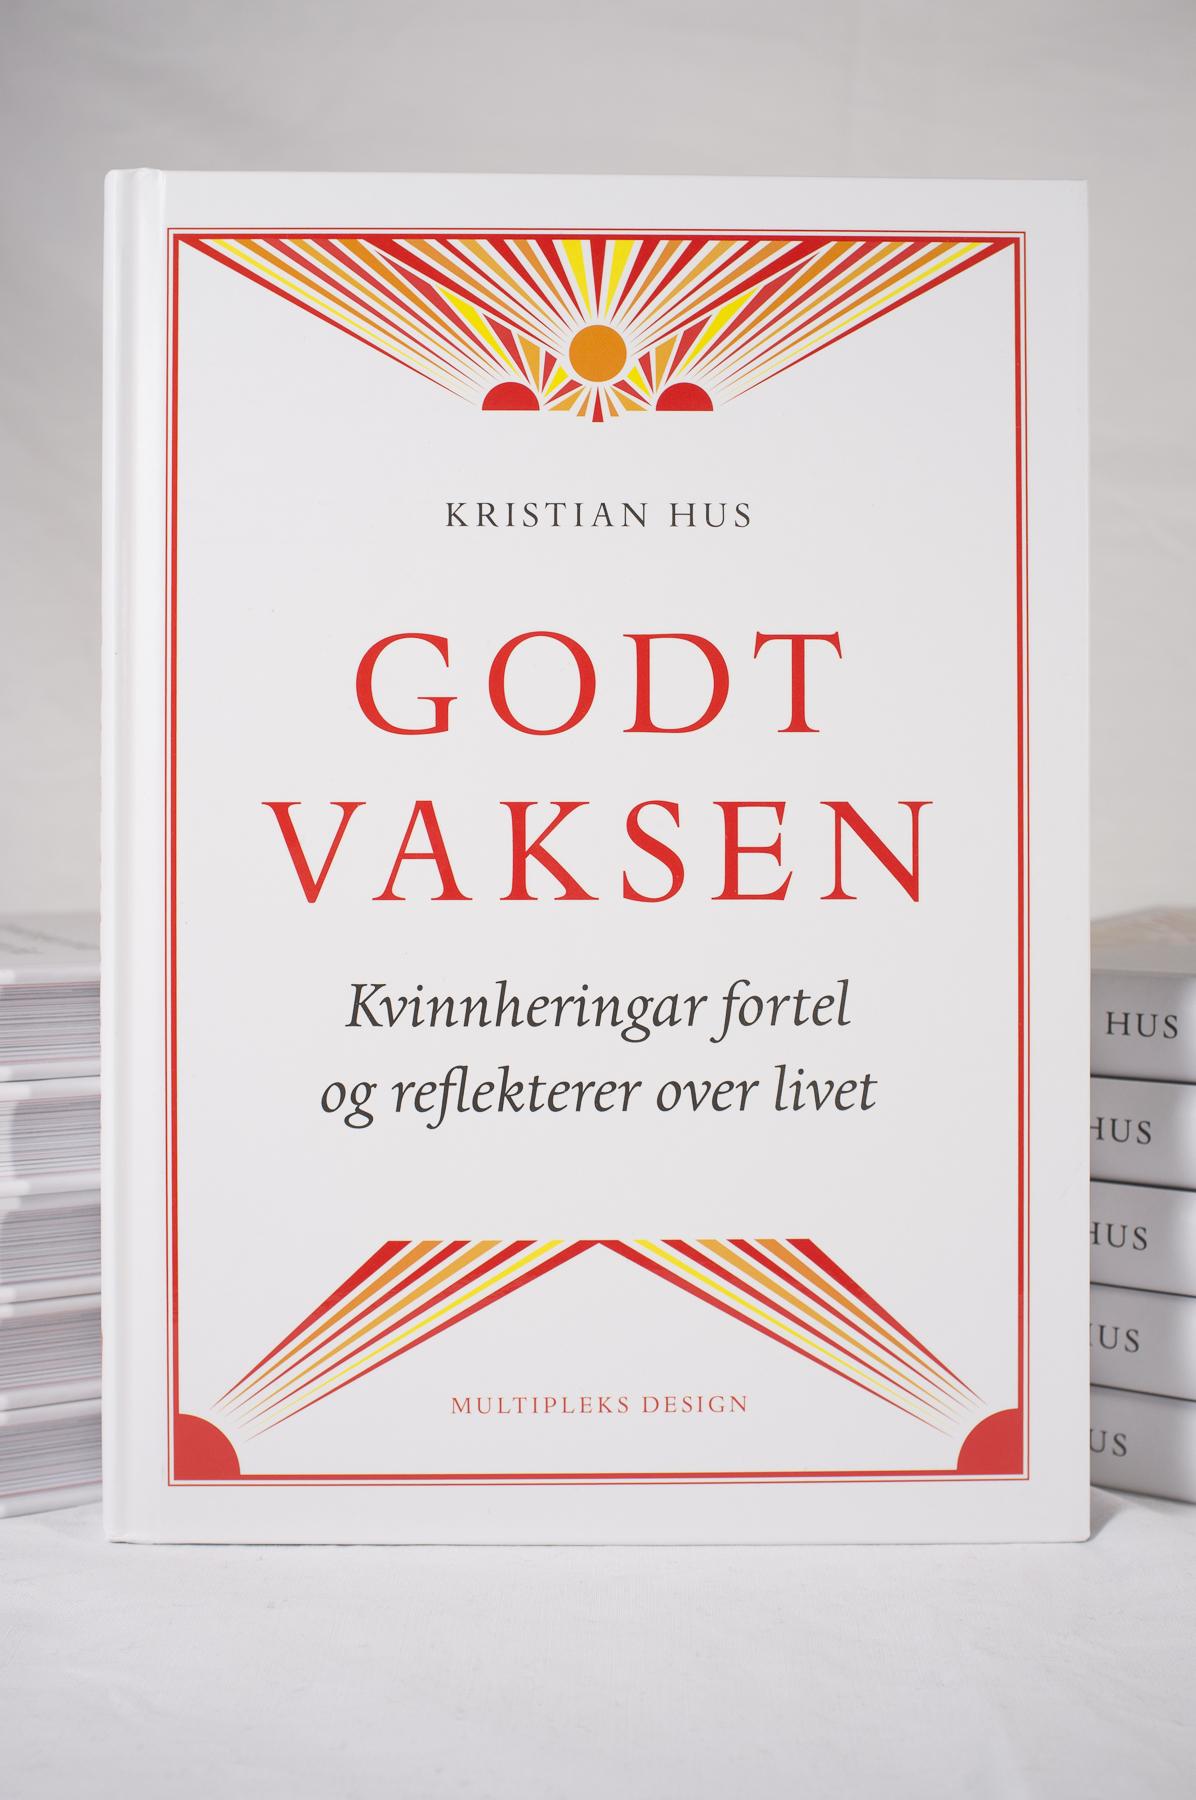 Omslaget på boka  Godt vaksen .